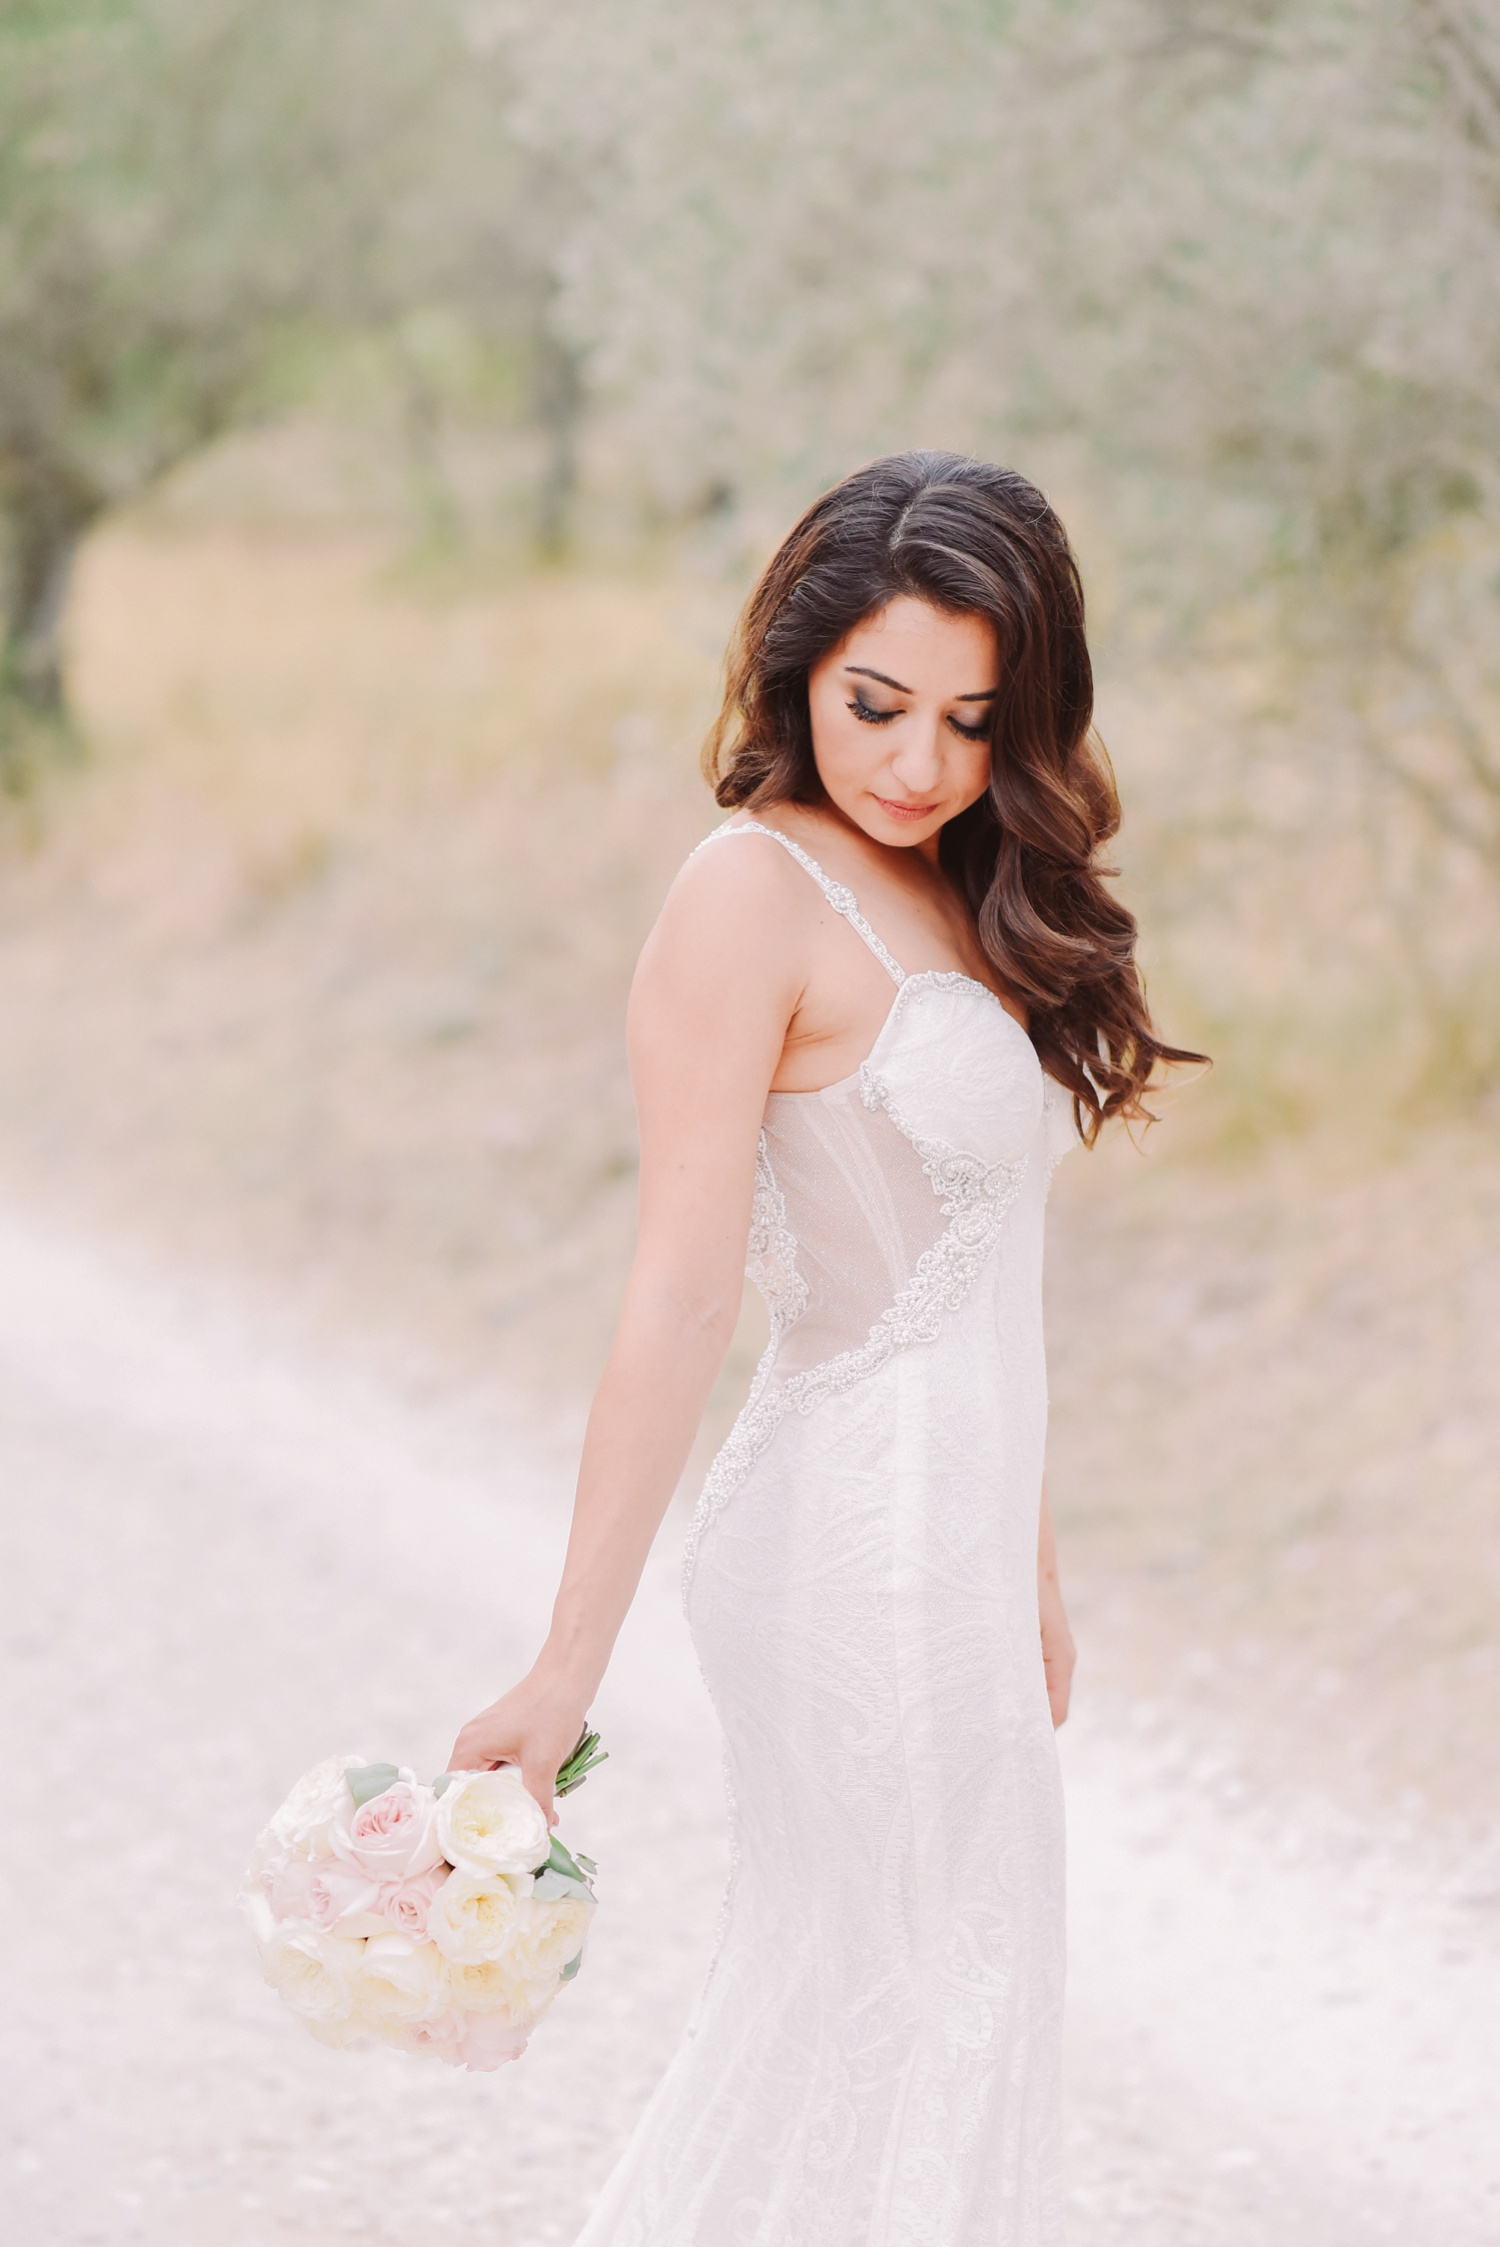 wedding-photographer-florence-vincigliata-tuscany_1108.jpg